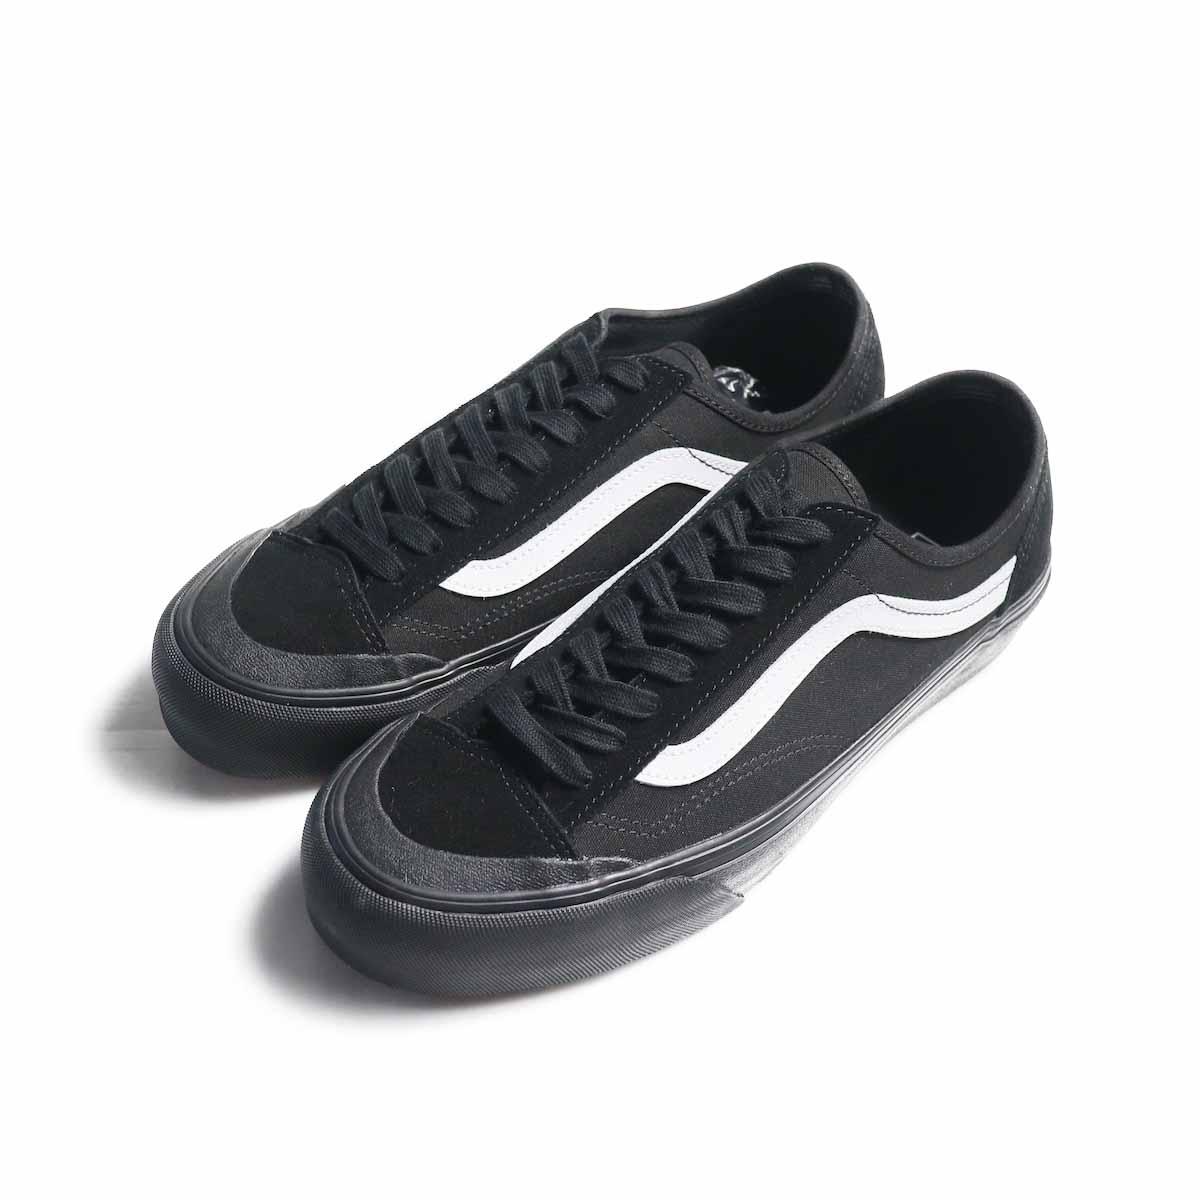 VANS / Style36 Decon SF -Black